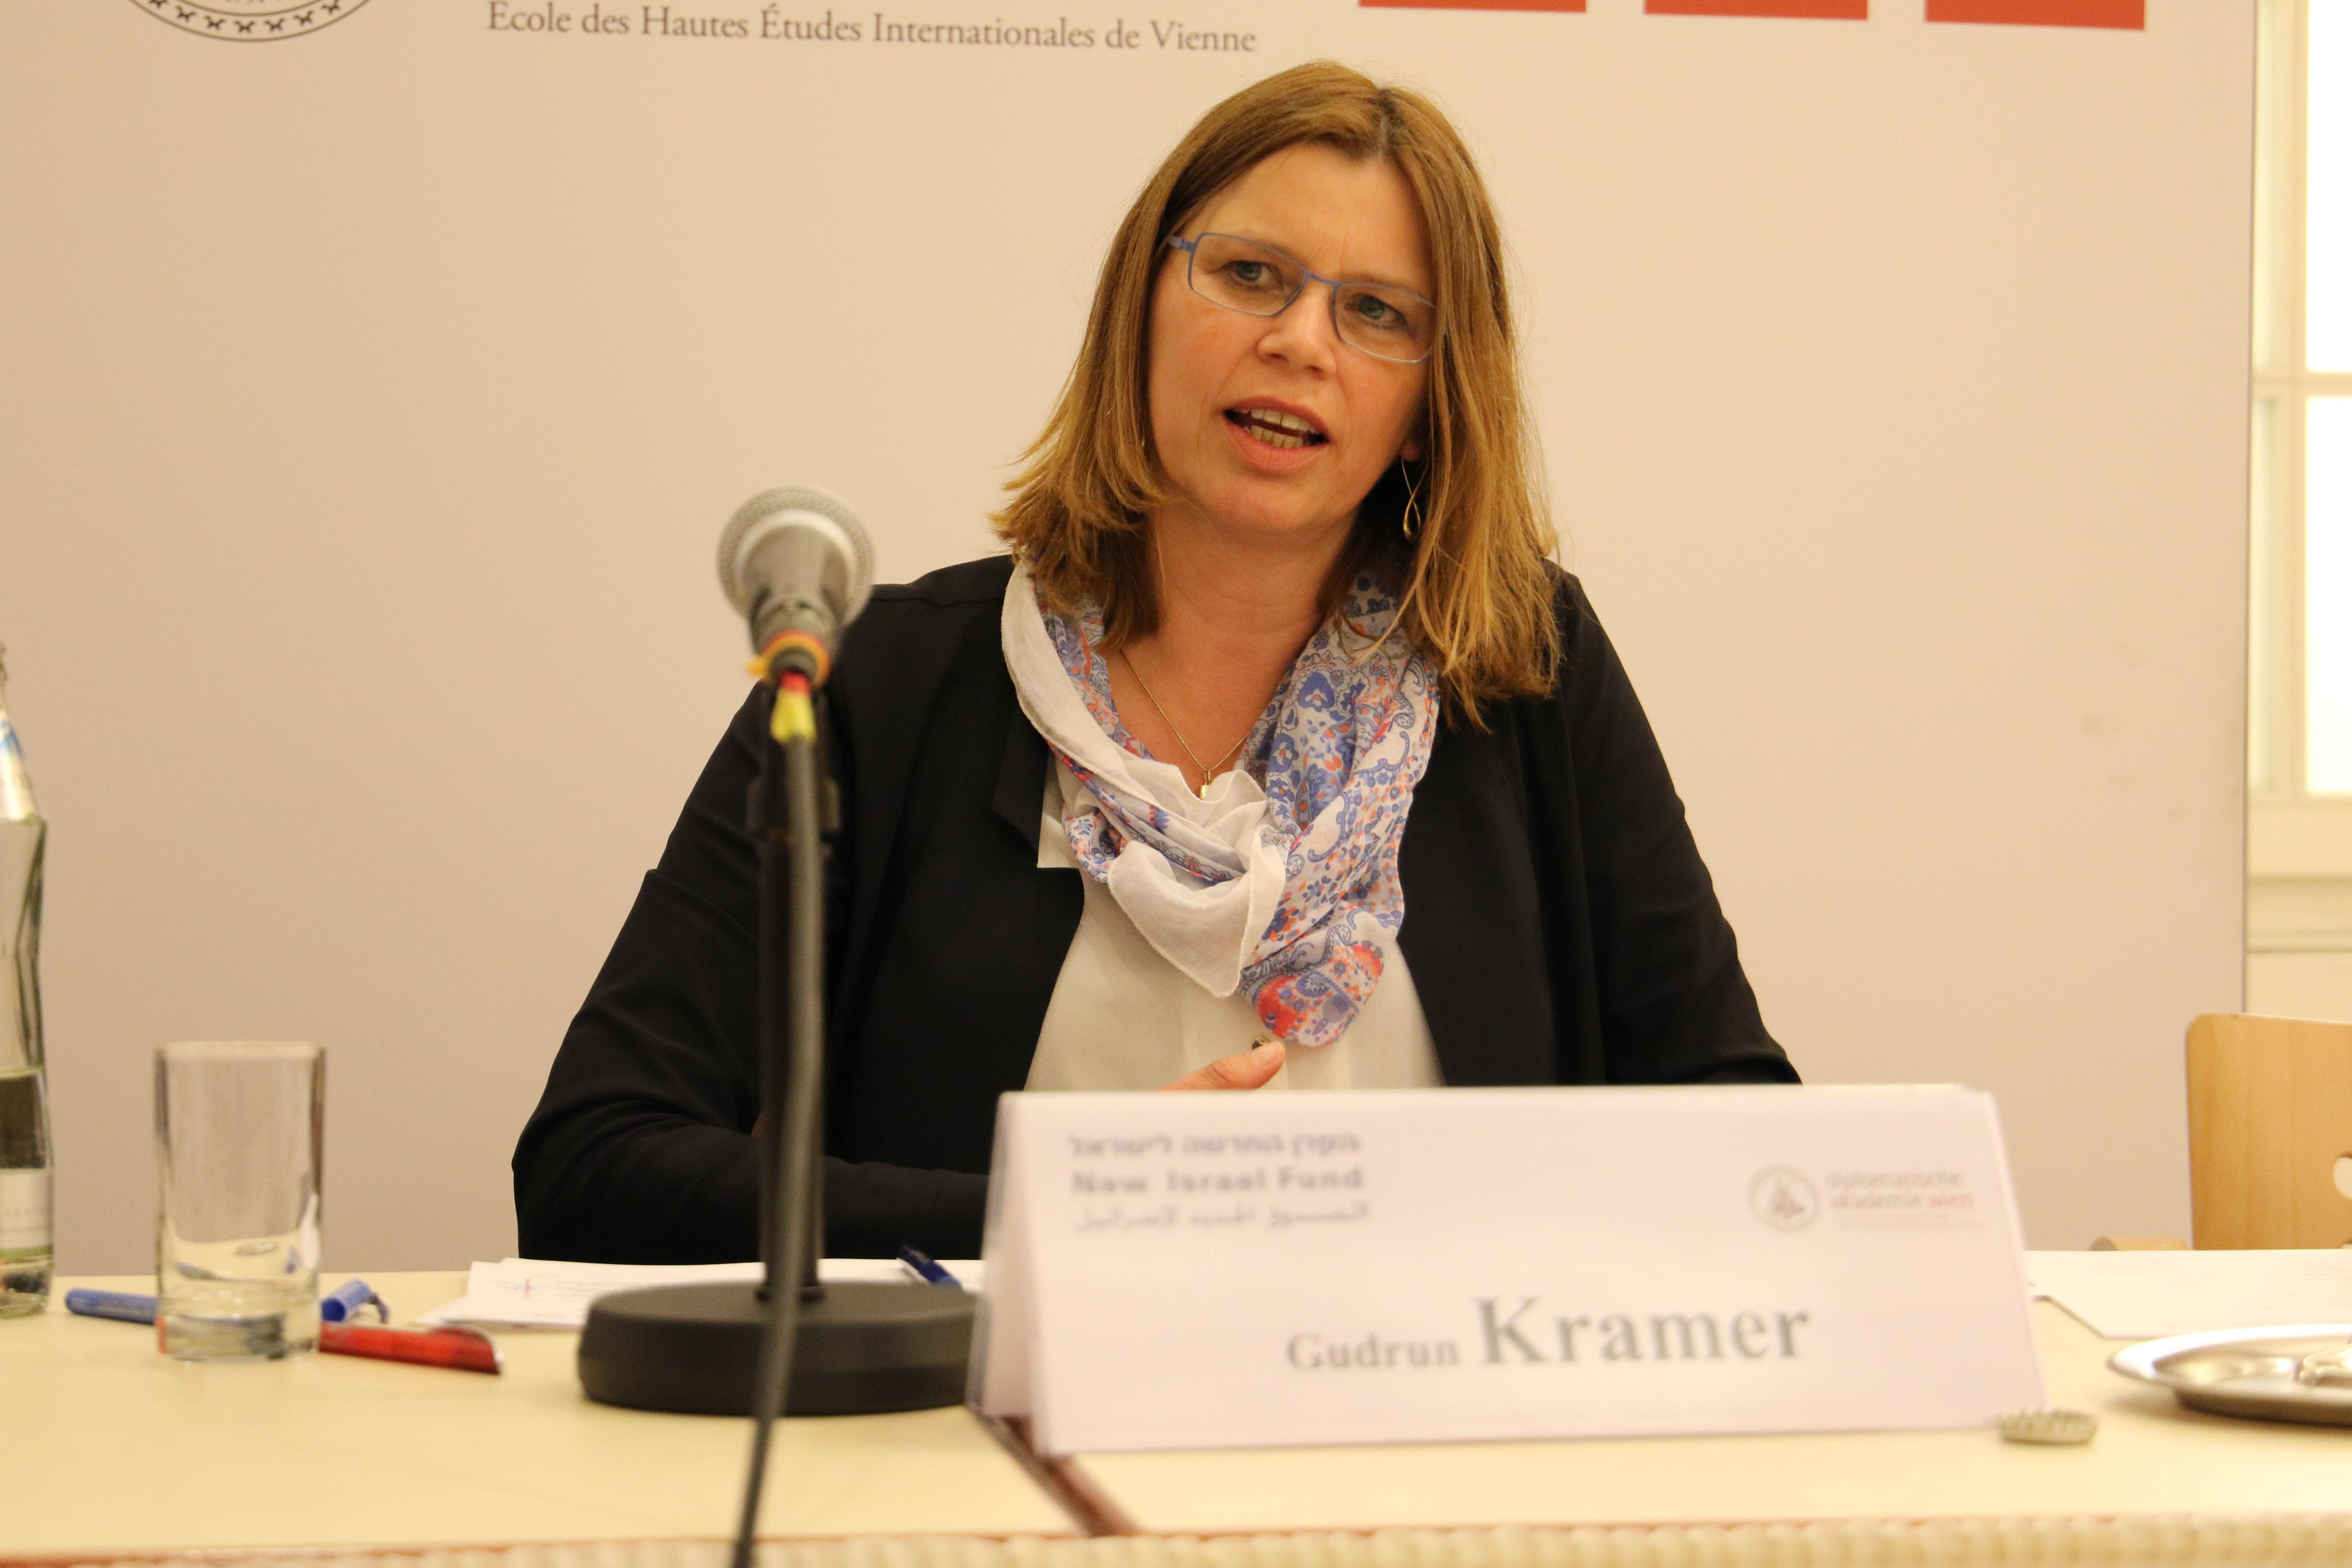 Gudrun Kramer, Director of ASPR